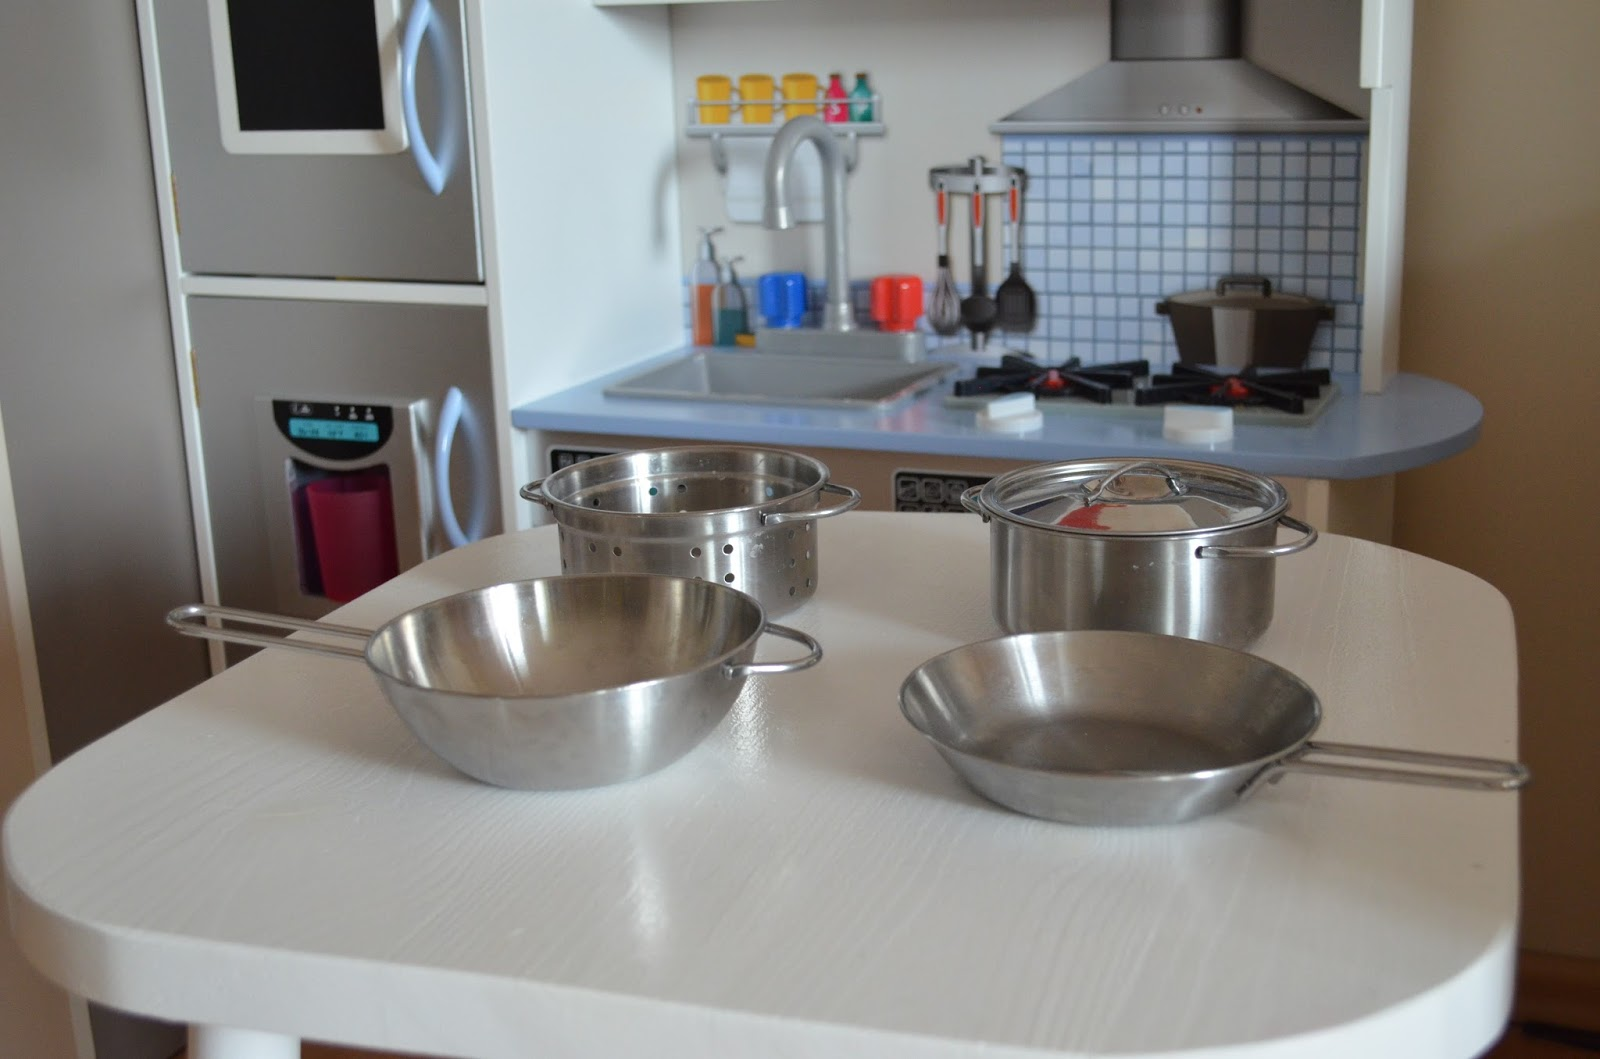 mamymalucha Drewniana Kuchnia dla Malucha -> Kuchnia Drewniana Chad Valley